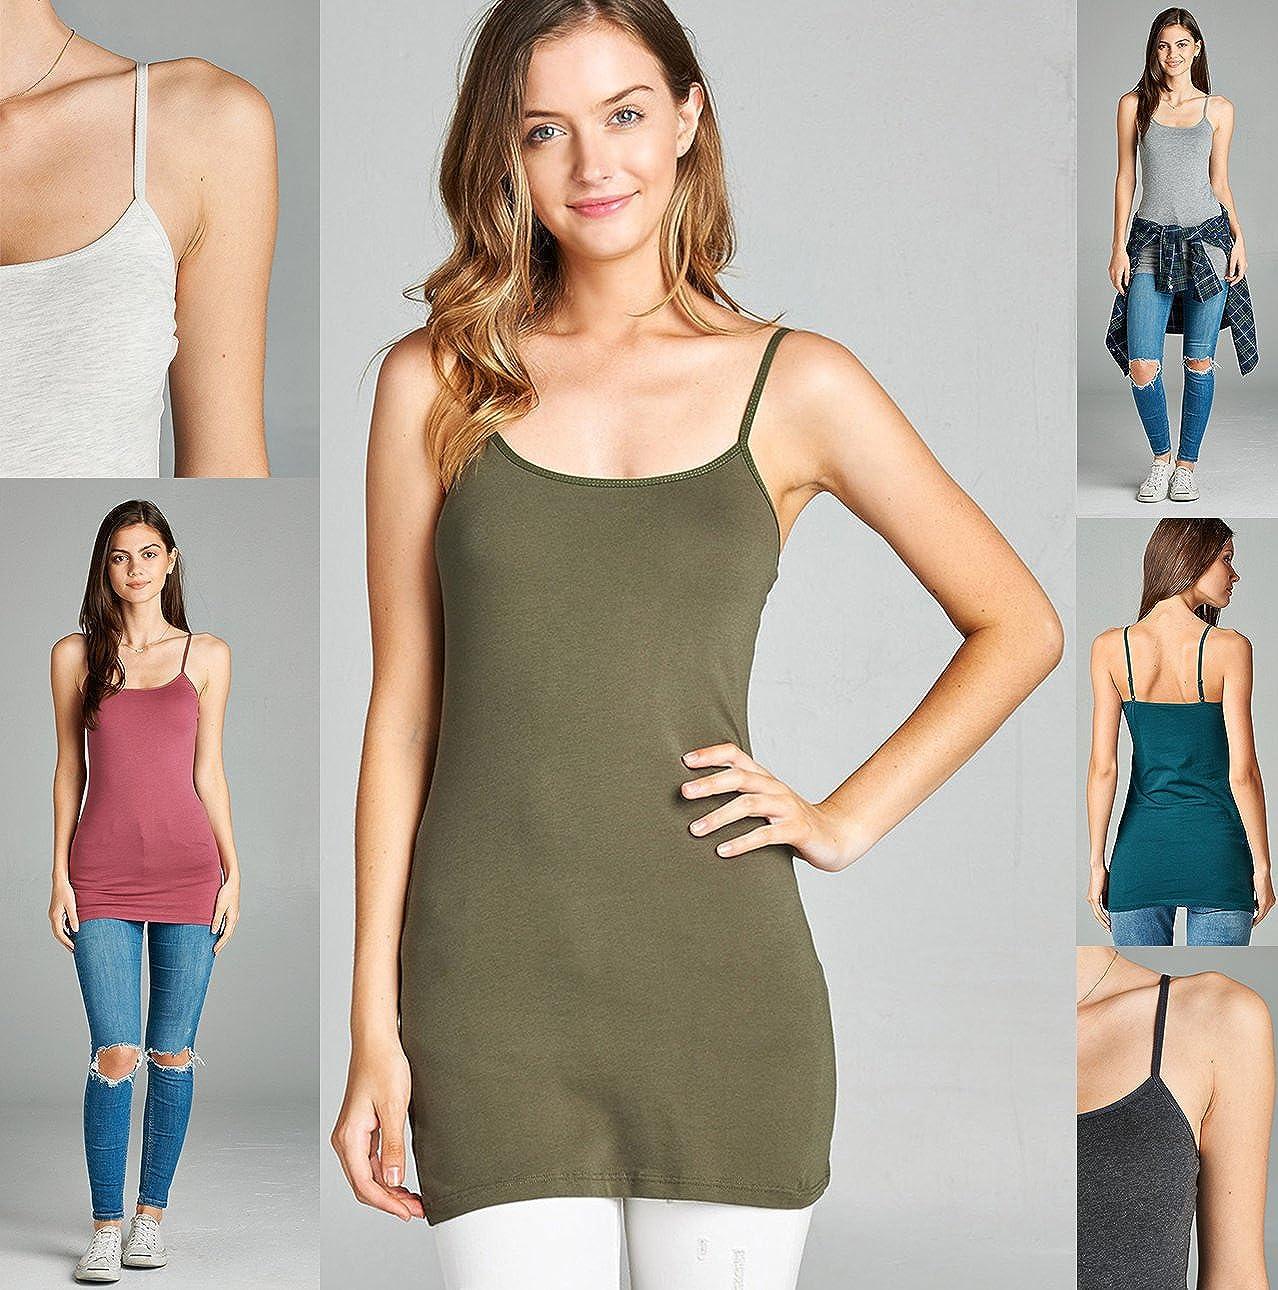 04e5a3f904201 Amazon.com  Emmalise Women s Basic Casual Long Camisole Cami Top Regular  and Plus Sizes  Clothing